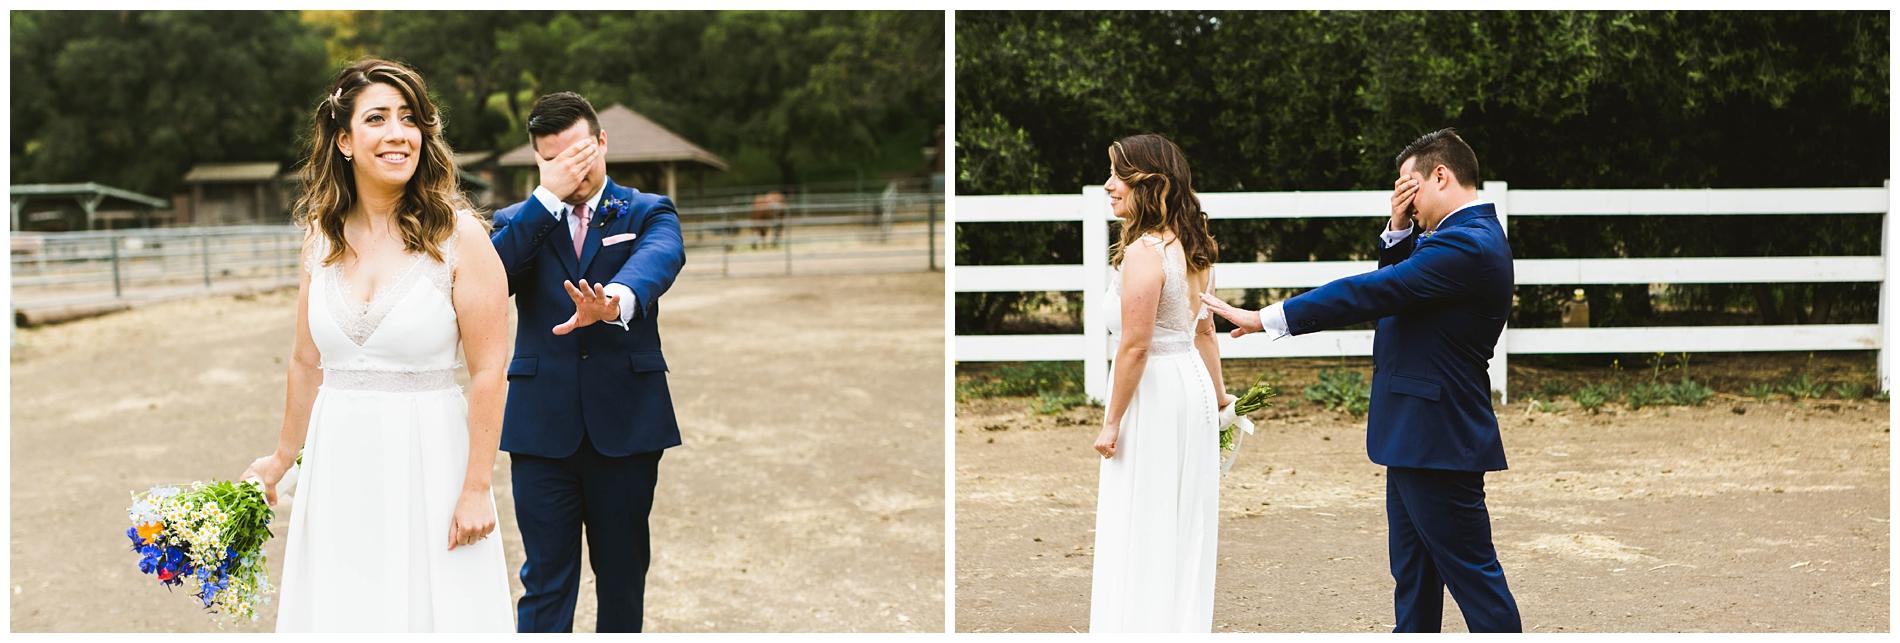 Saddlerock Ranch WeddingPhotography_0012.jpg